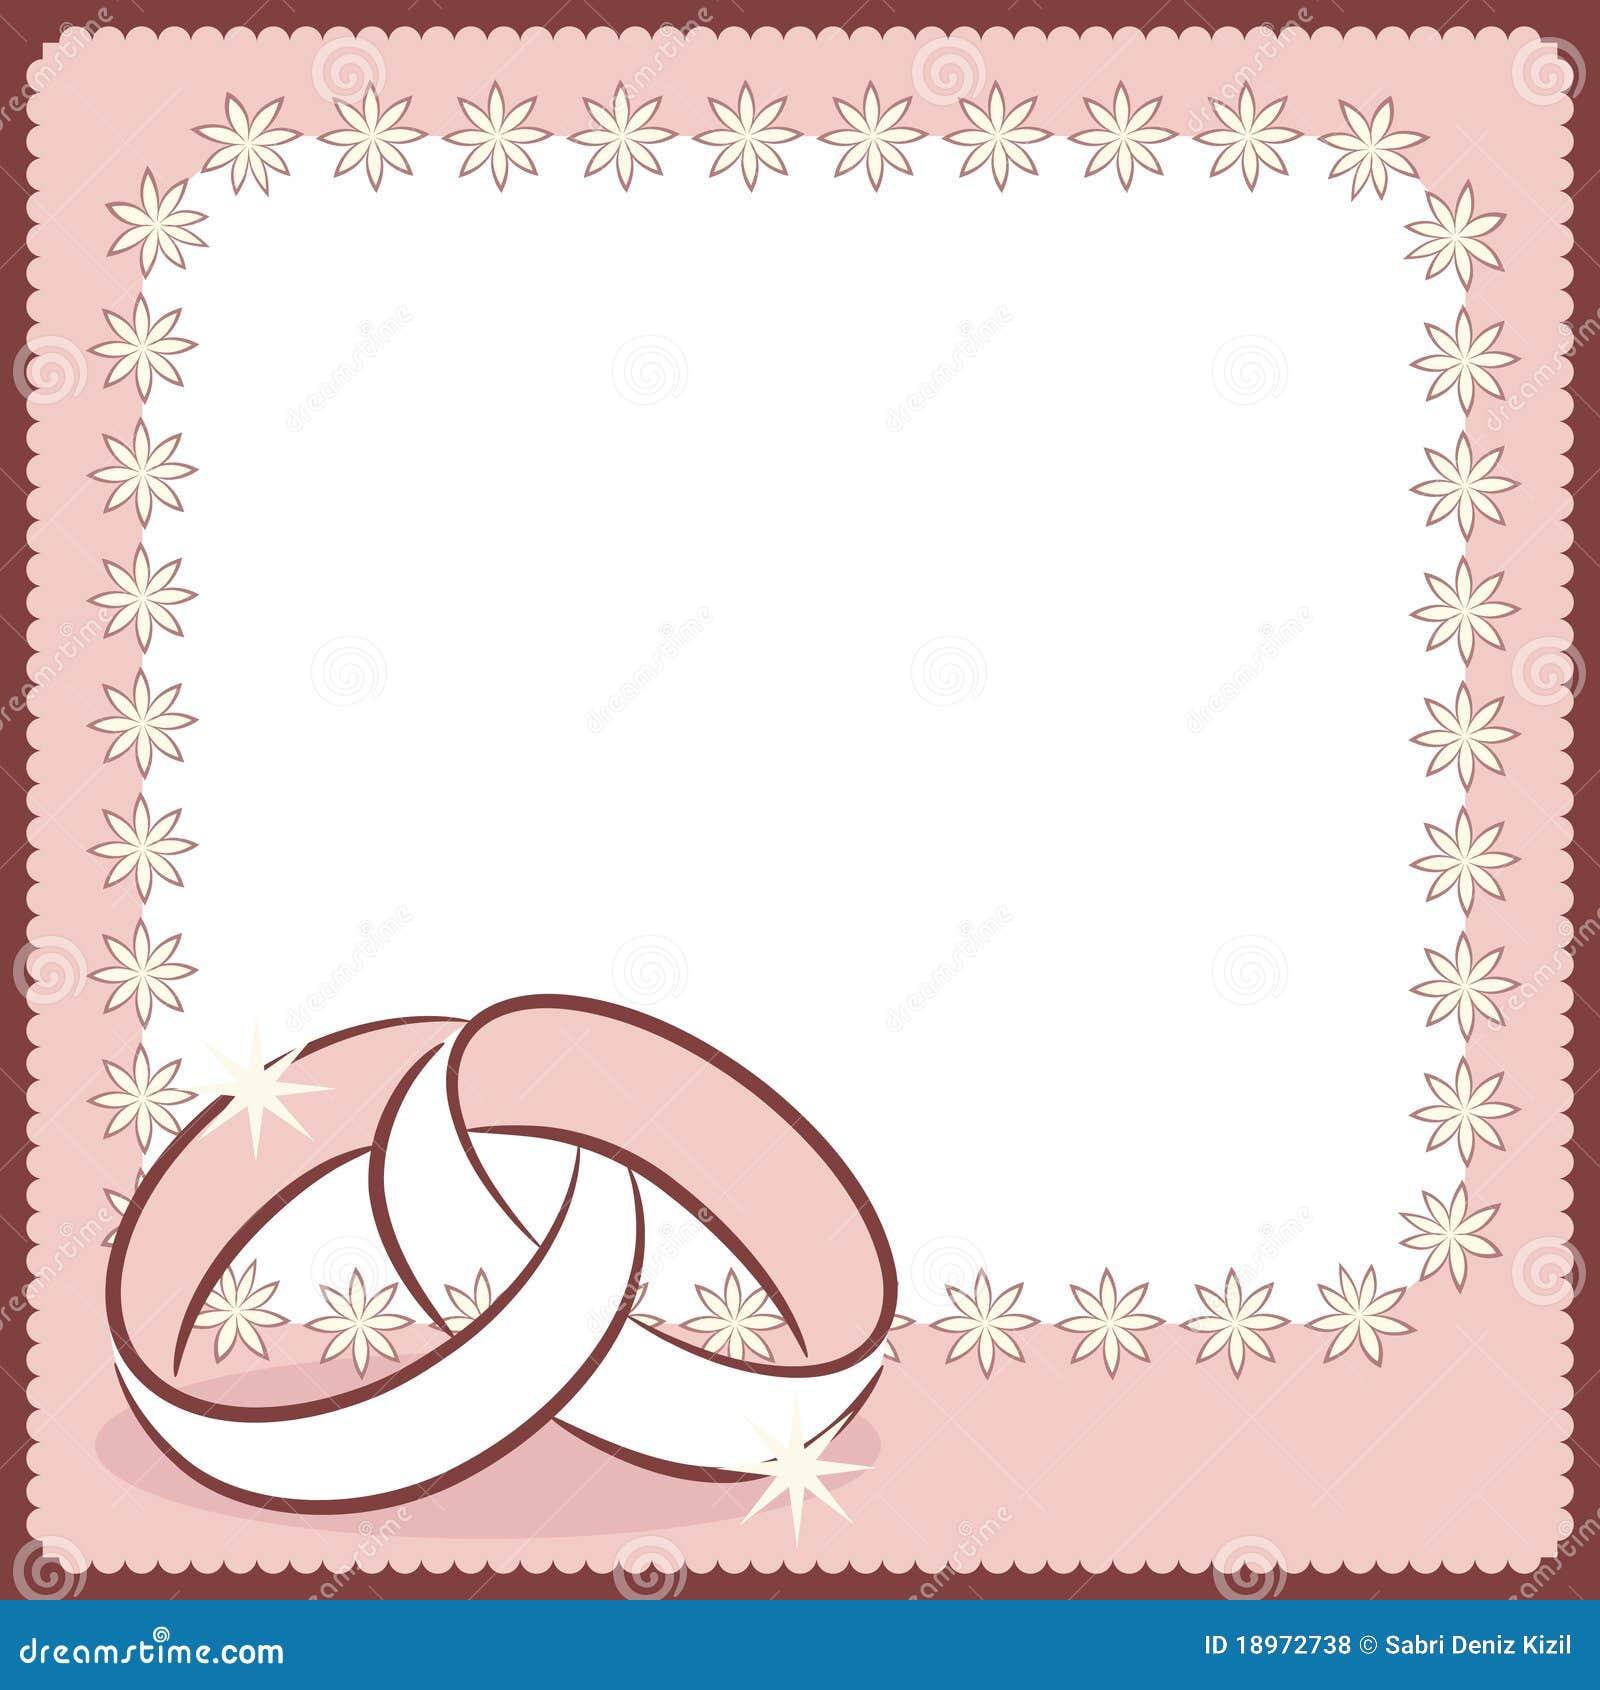 Wedding Card Royalty Free Stock Photos - Image: 18972738